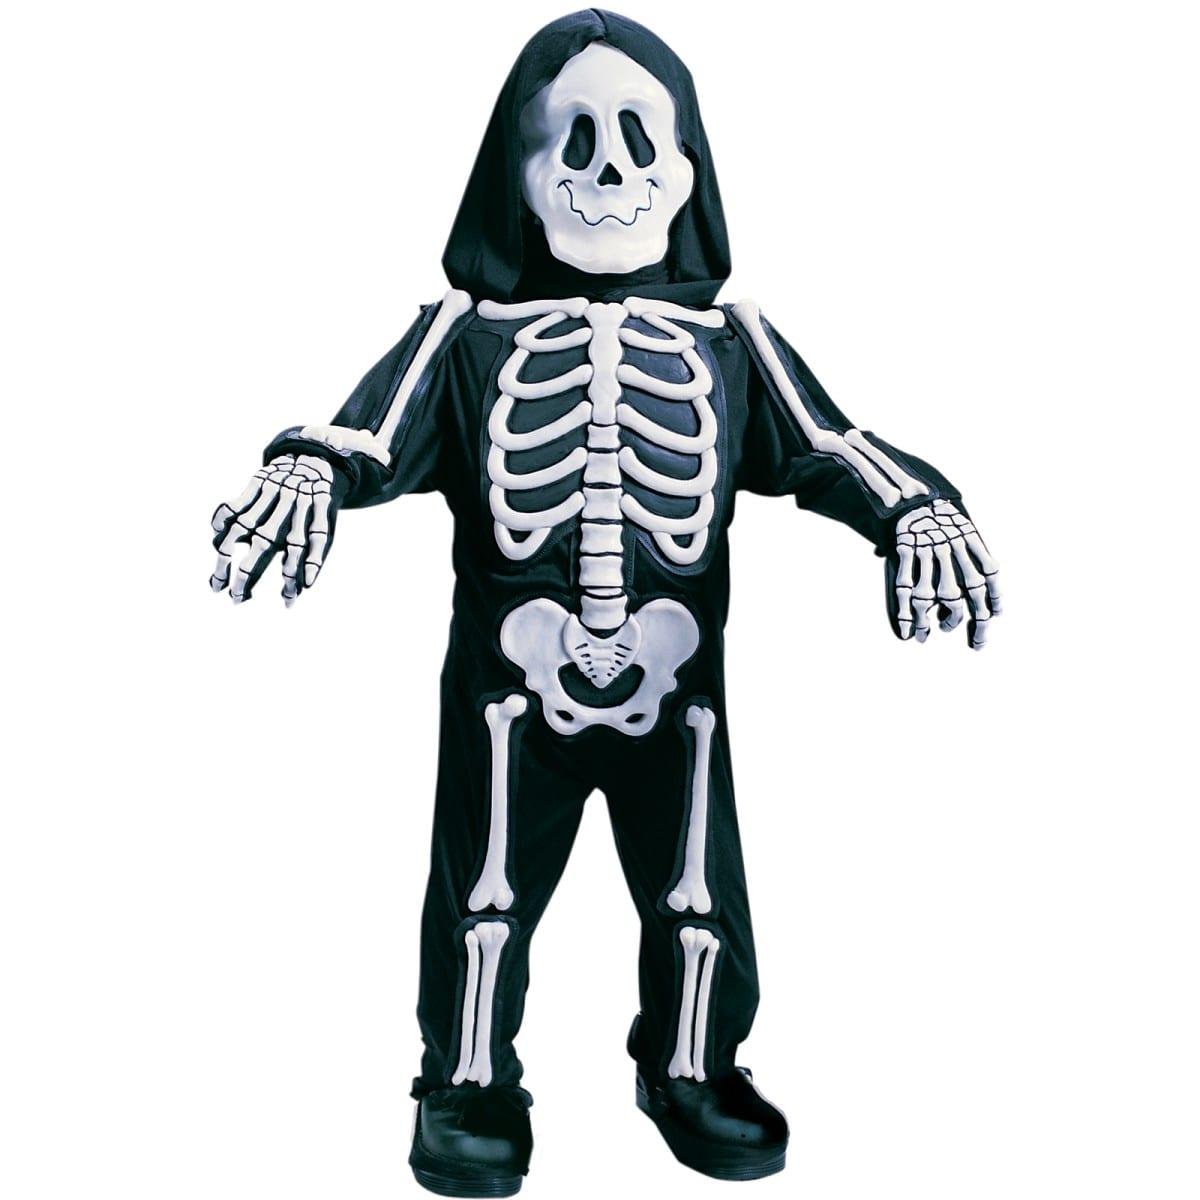 Top 10 Best Halloween Costume Ideas for kids 2013